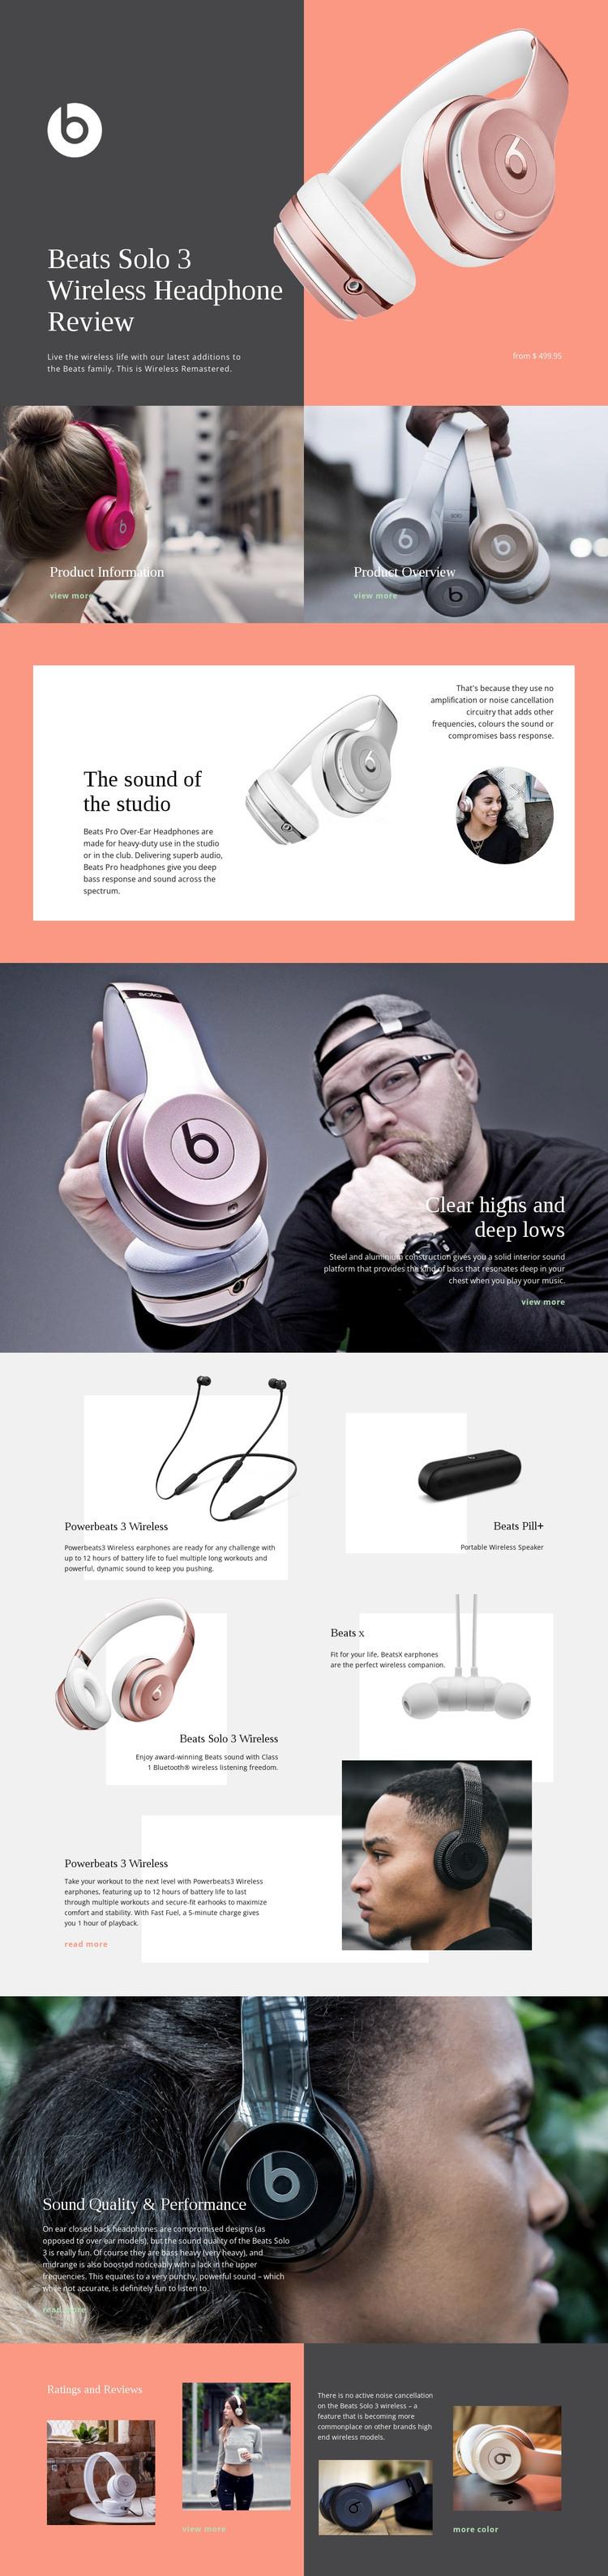 Beats Wireless Web Design